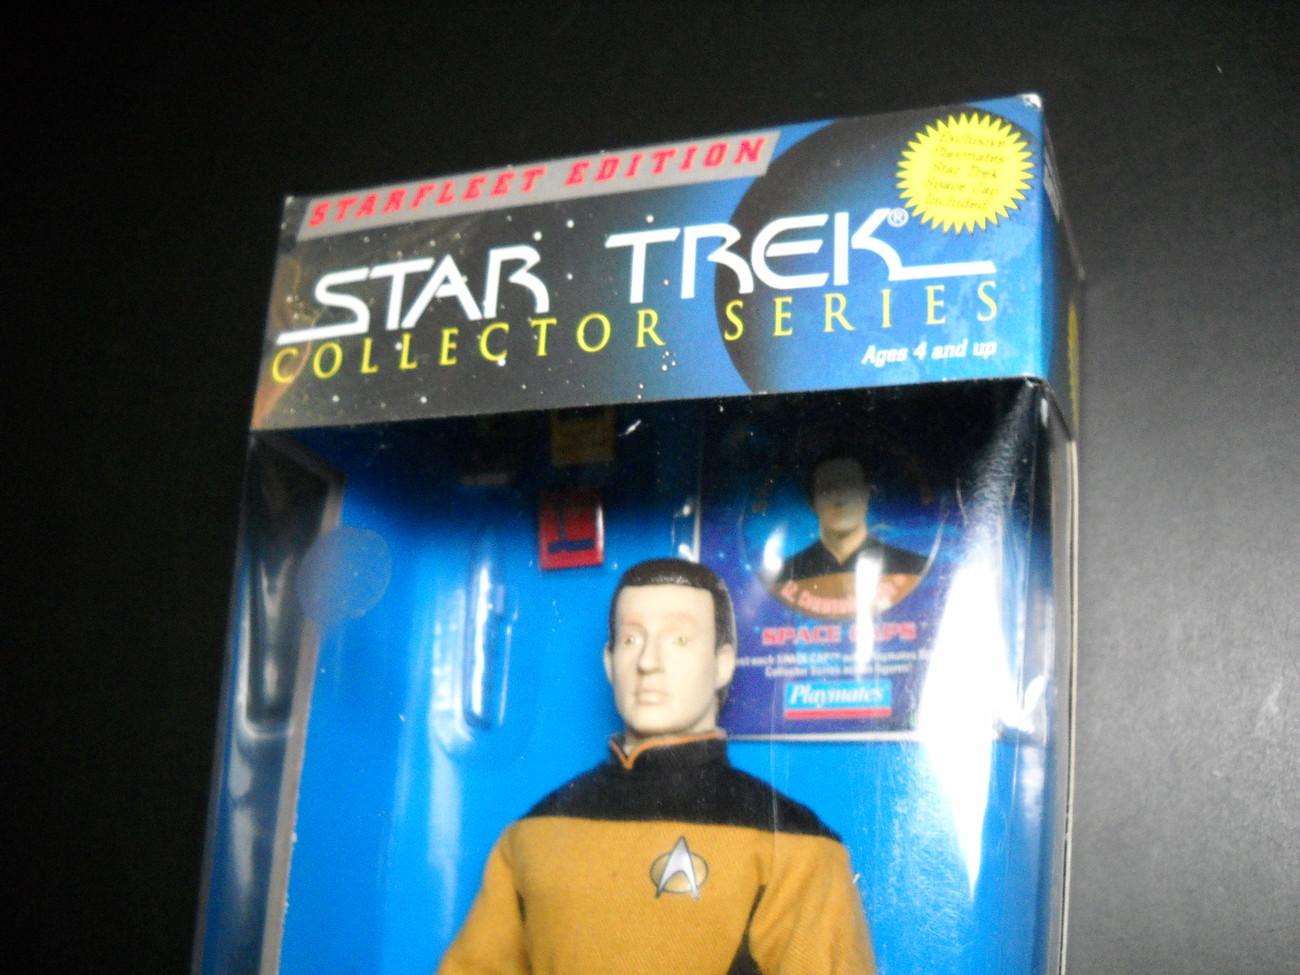 Star Trek Collectors Series Starfleet Edition Lt Commander Data 1995 Sealed Box